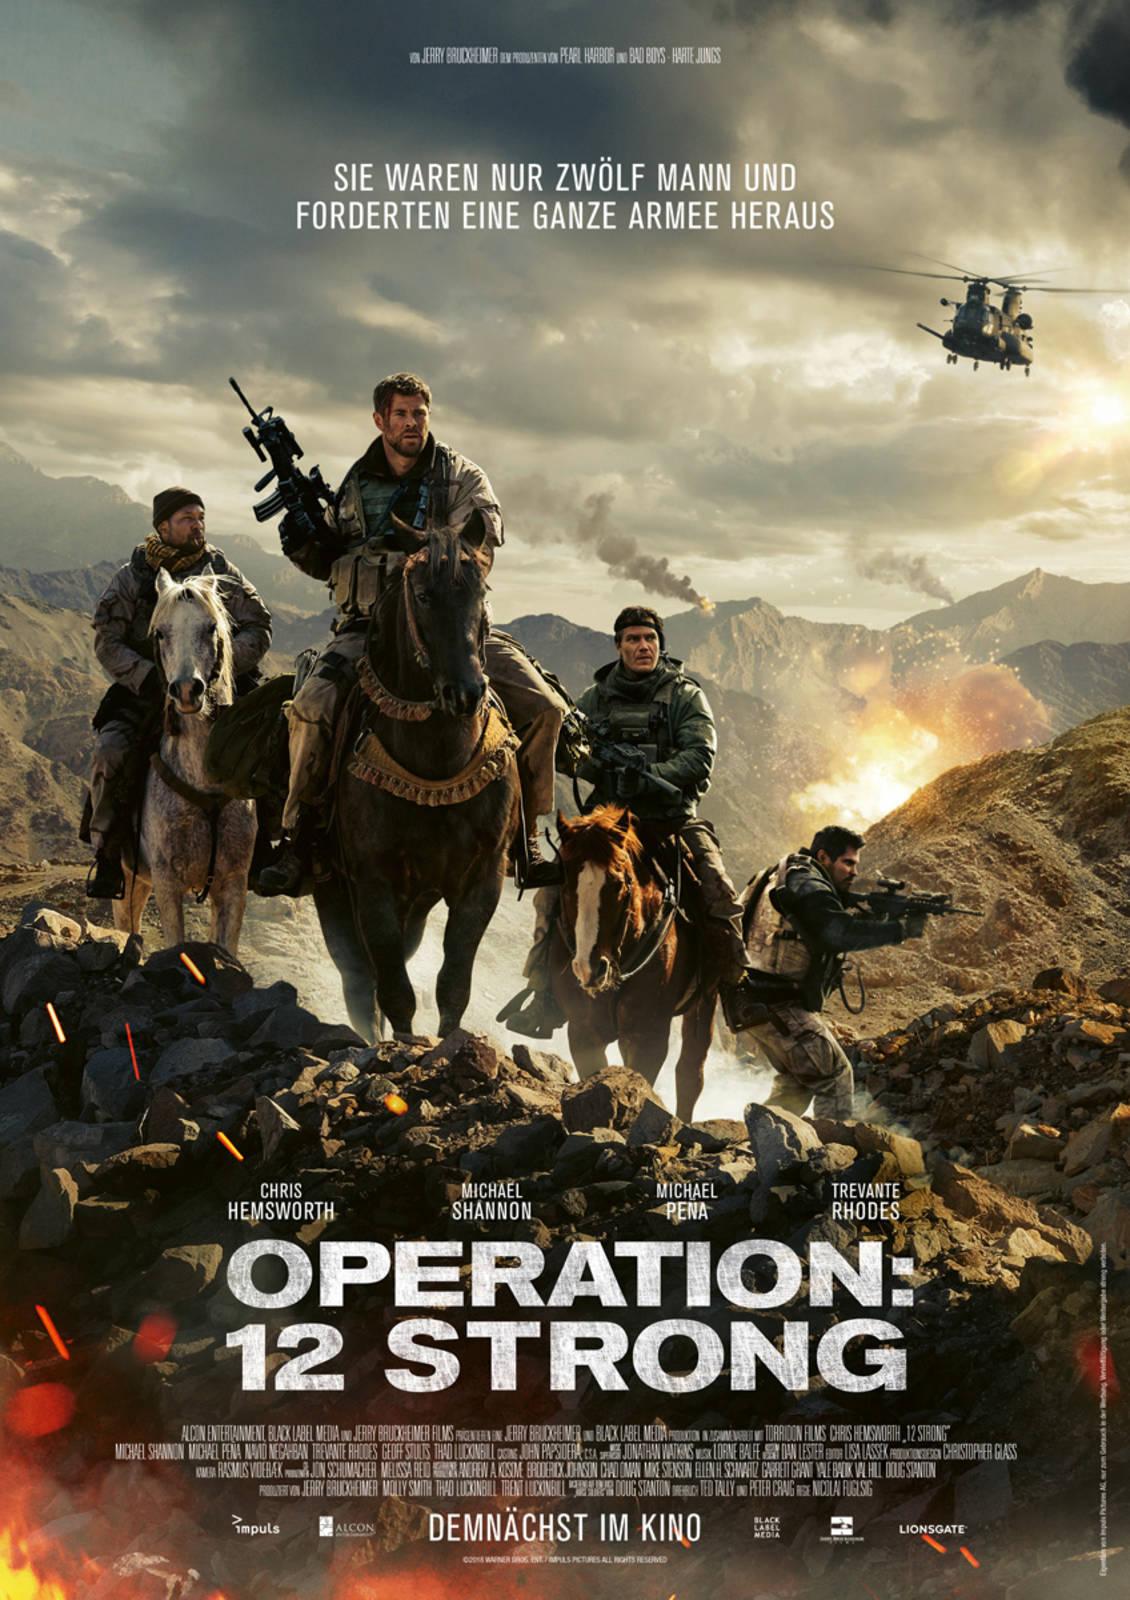 Operation 12